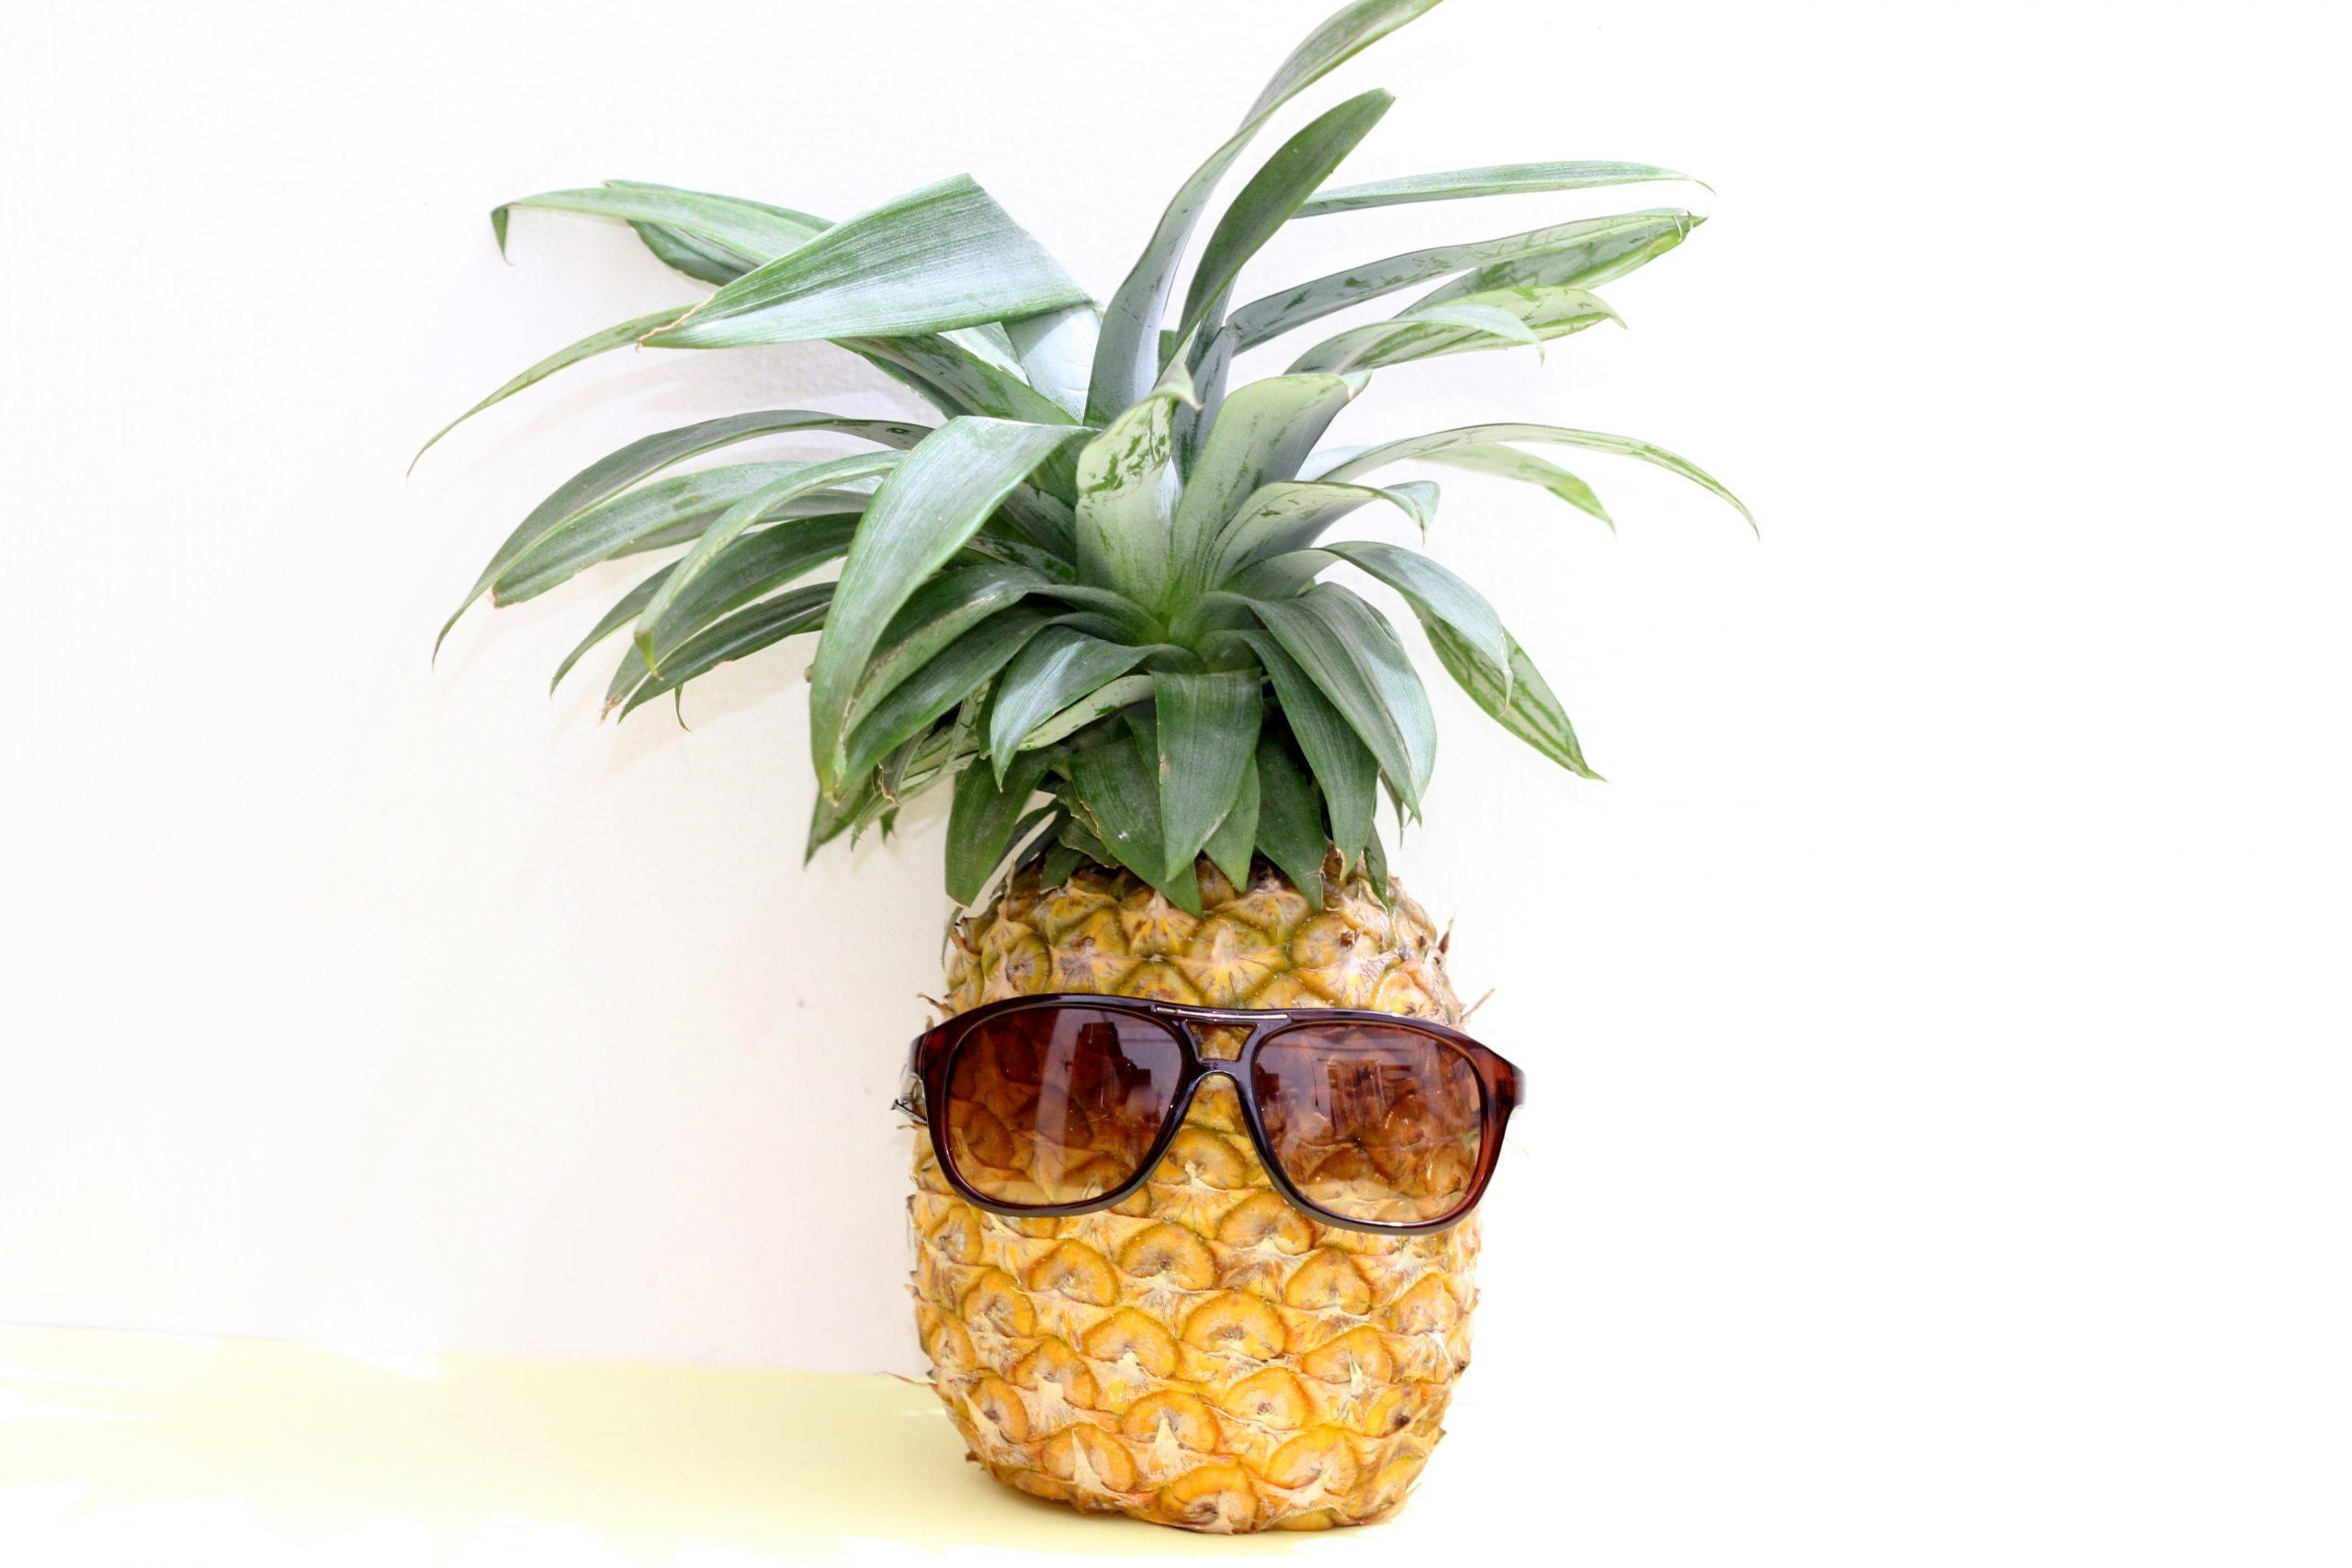 sunglasses on a pineapple